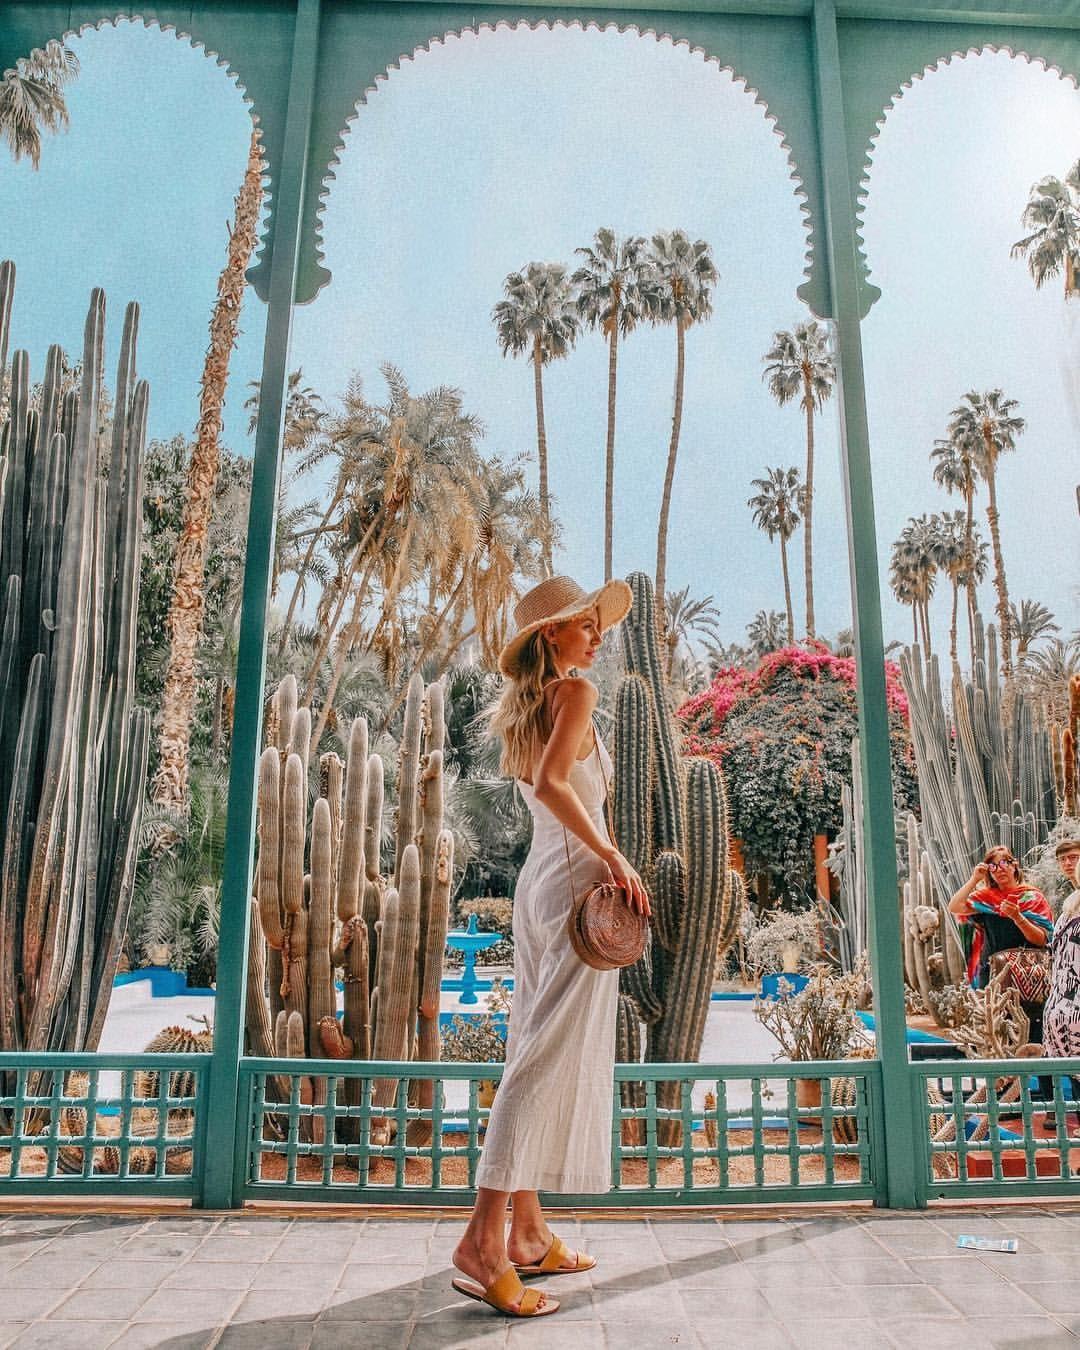 Le Jardin Majorelle Marrakech Alohassandals Alohasandals